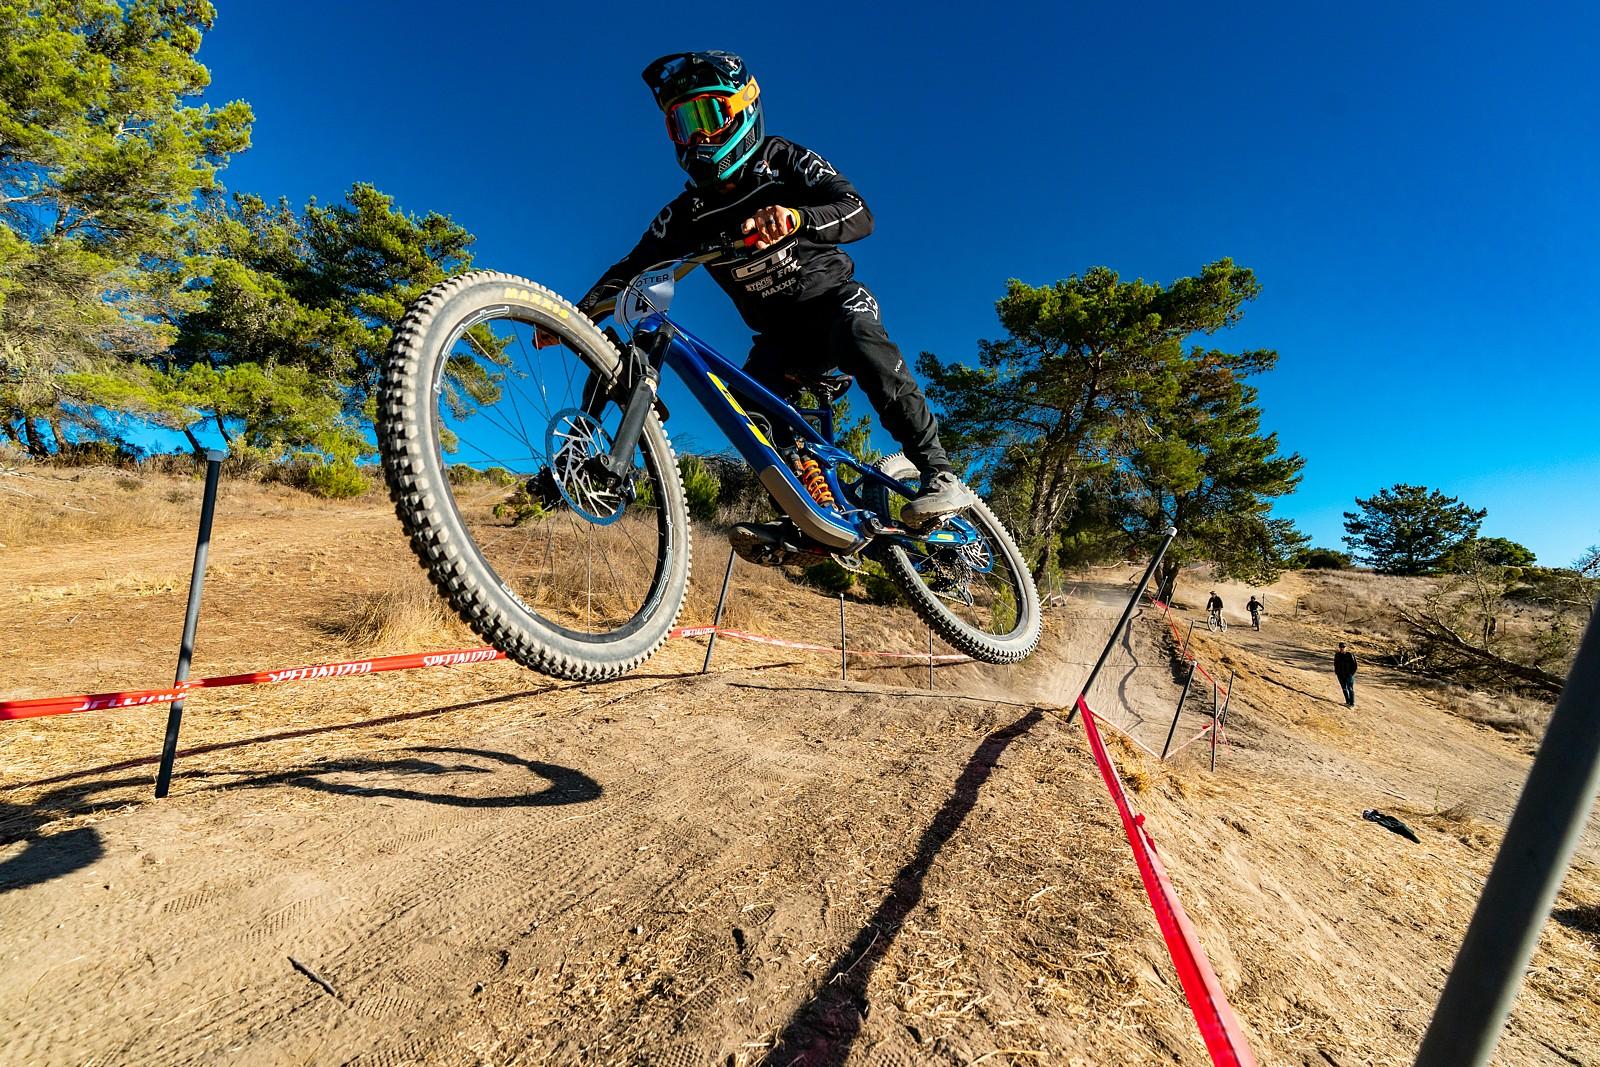 Justin Fierro - Zuestman - Mountain Biking Pictures - Vital MTB